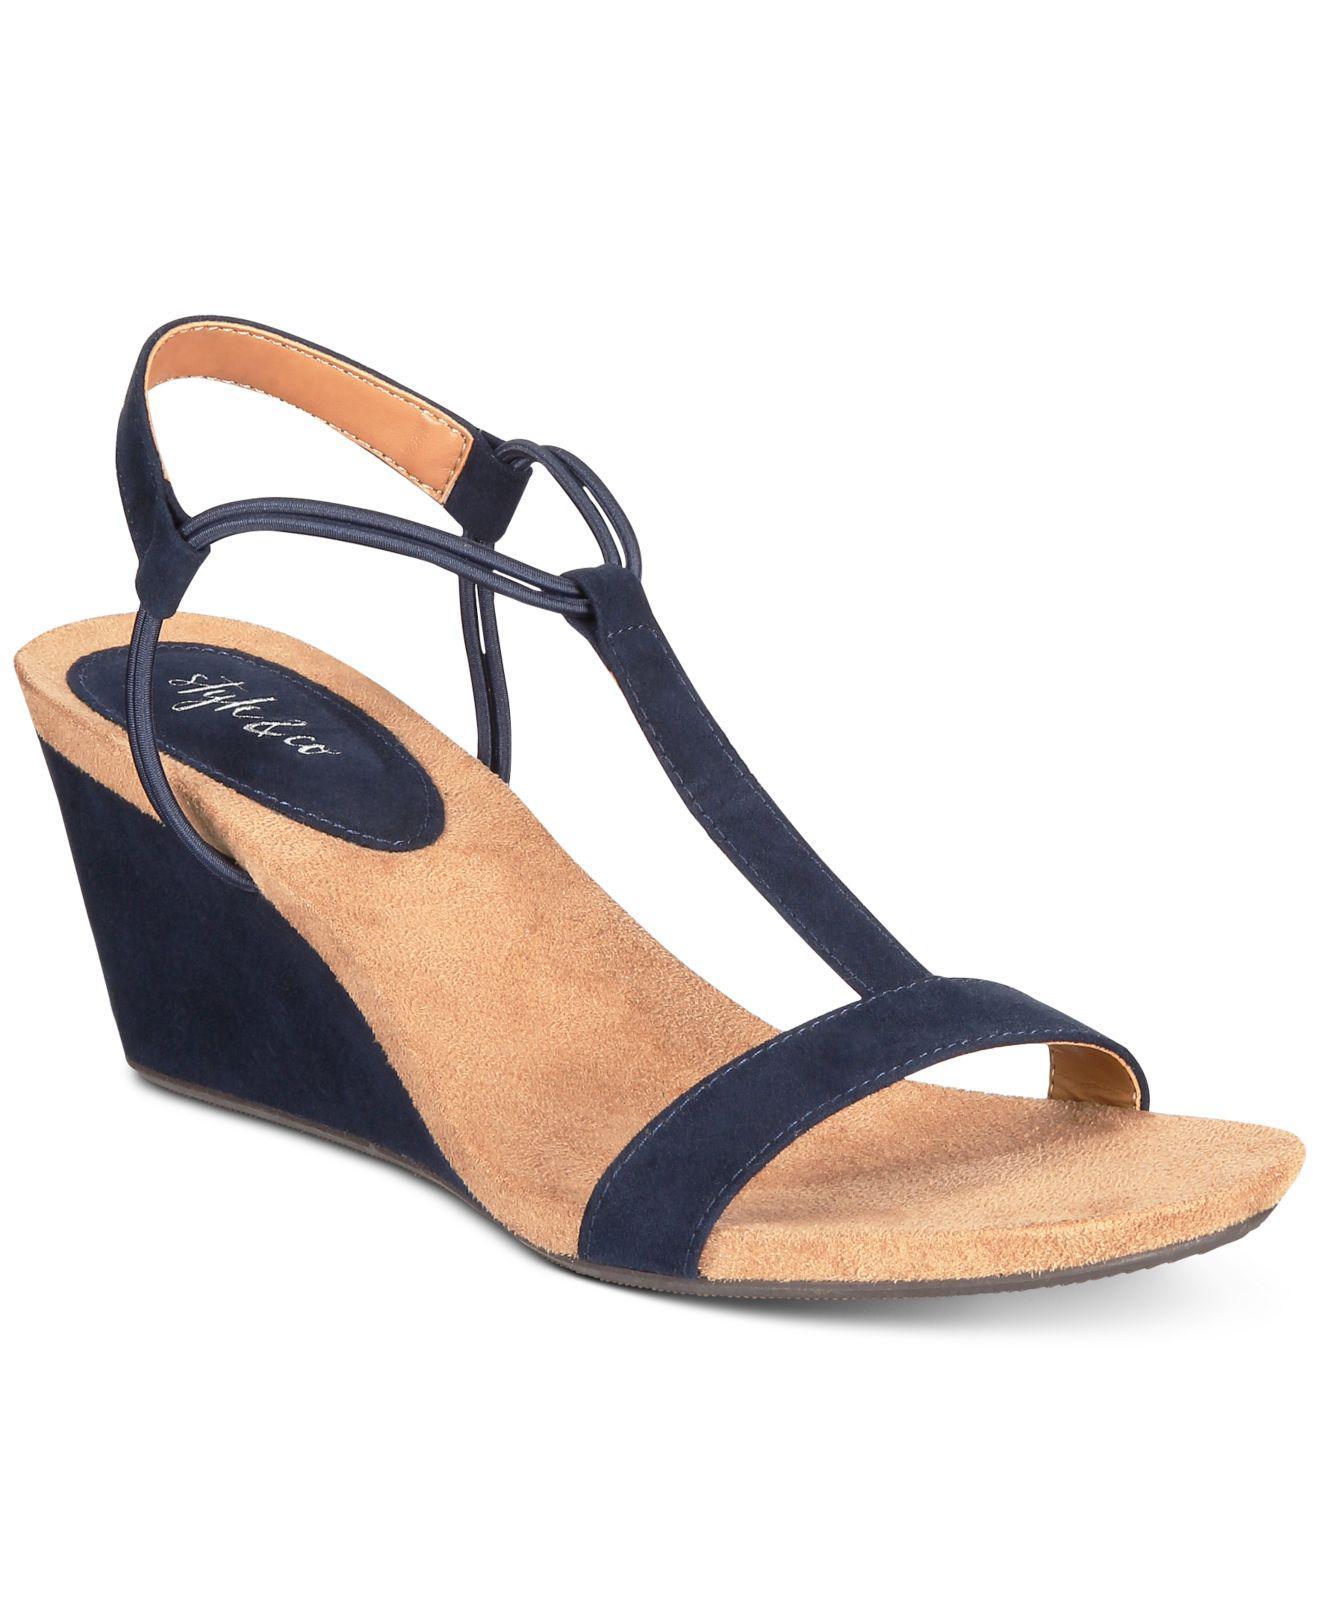 bb3cedbd5725 Style   Co. Womens Mulan Leather Open Toe Casual Platform